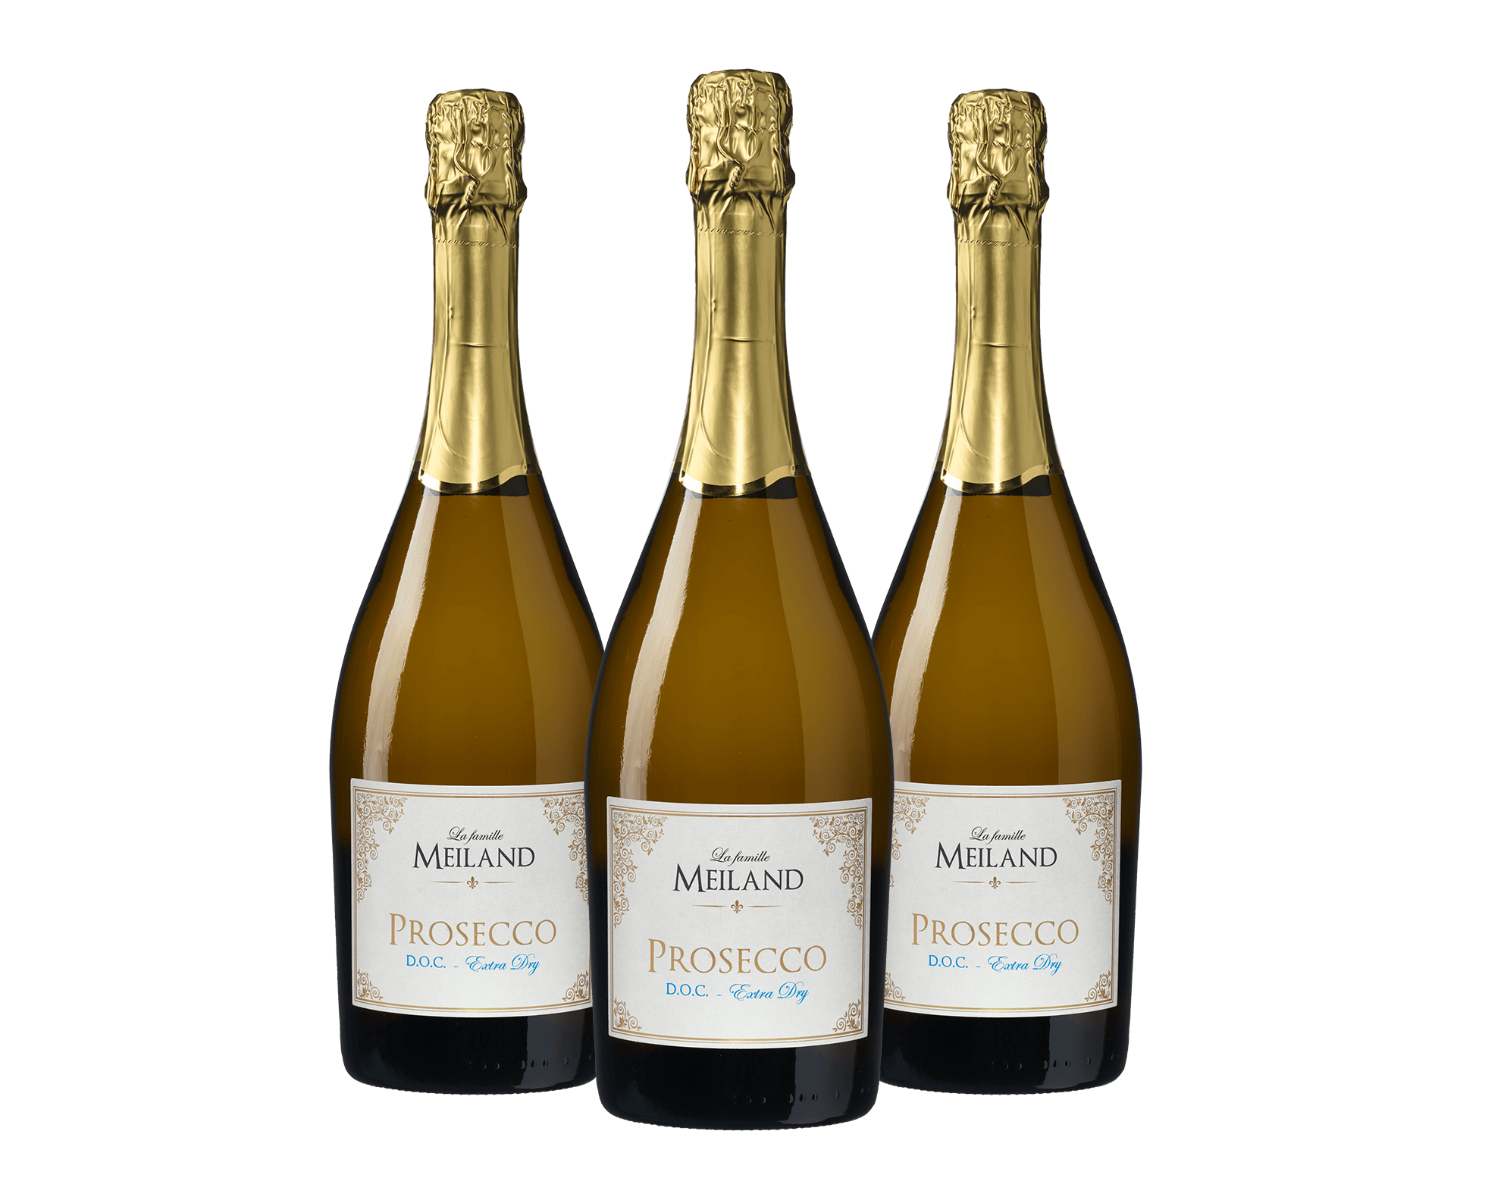 La famille Meiland Prosecco DOC Extra Dry (3 flessen)